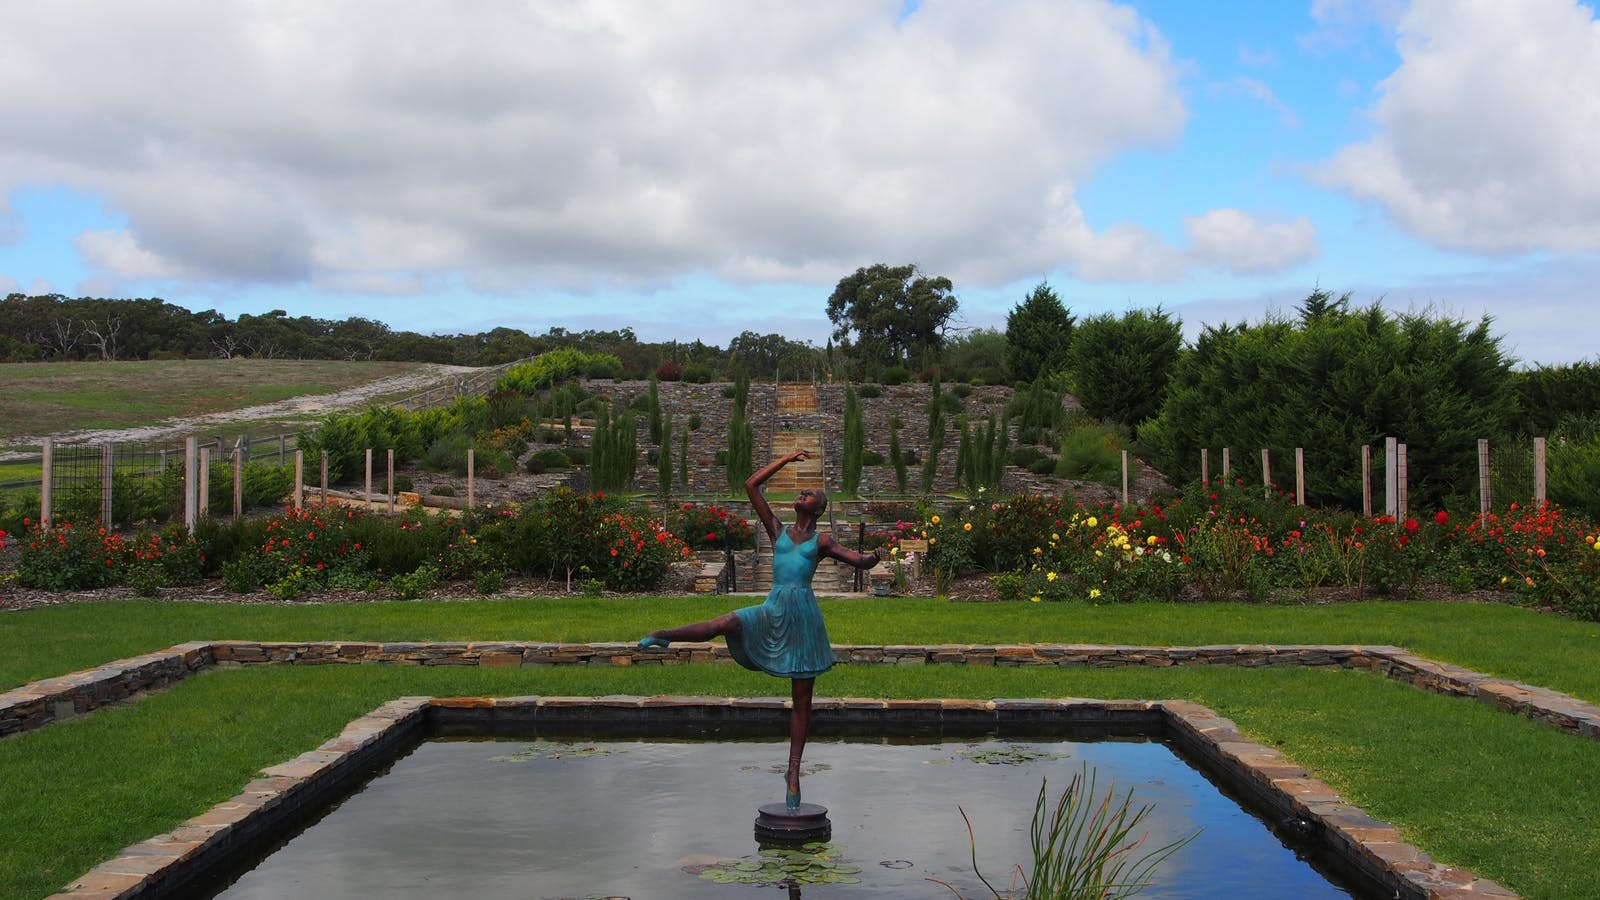 Lilli our ballerina statue takes center stage.